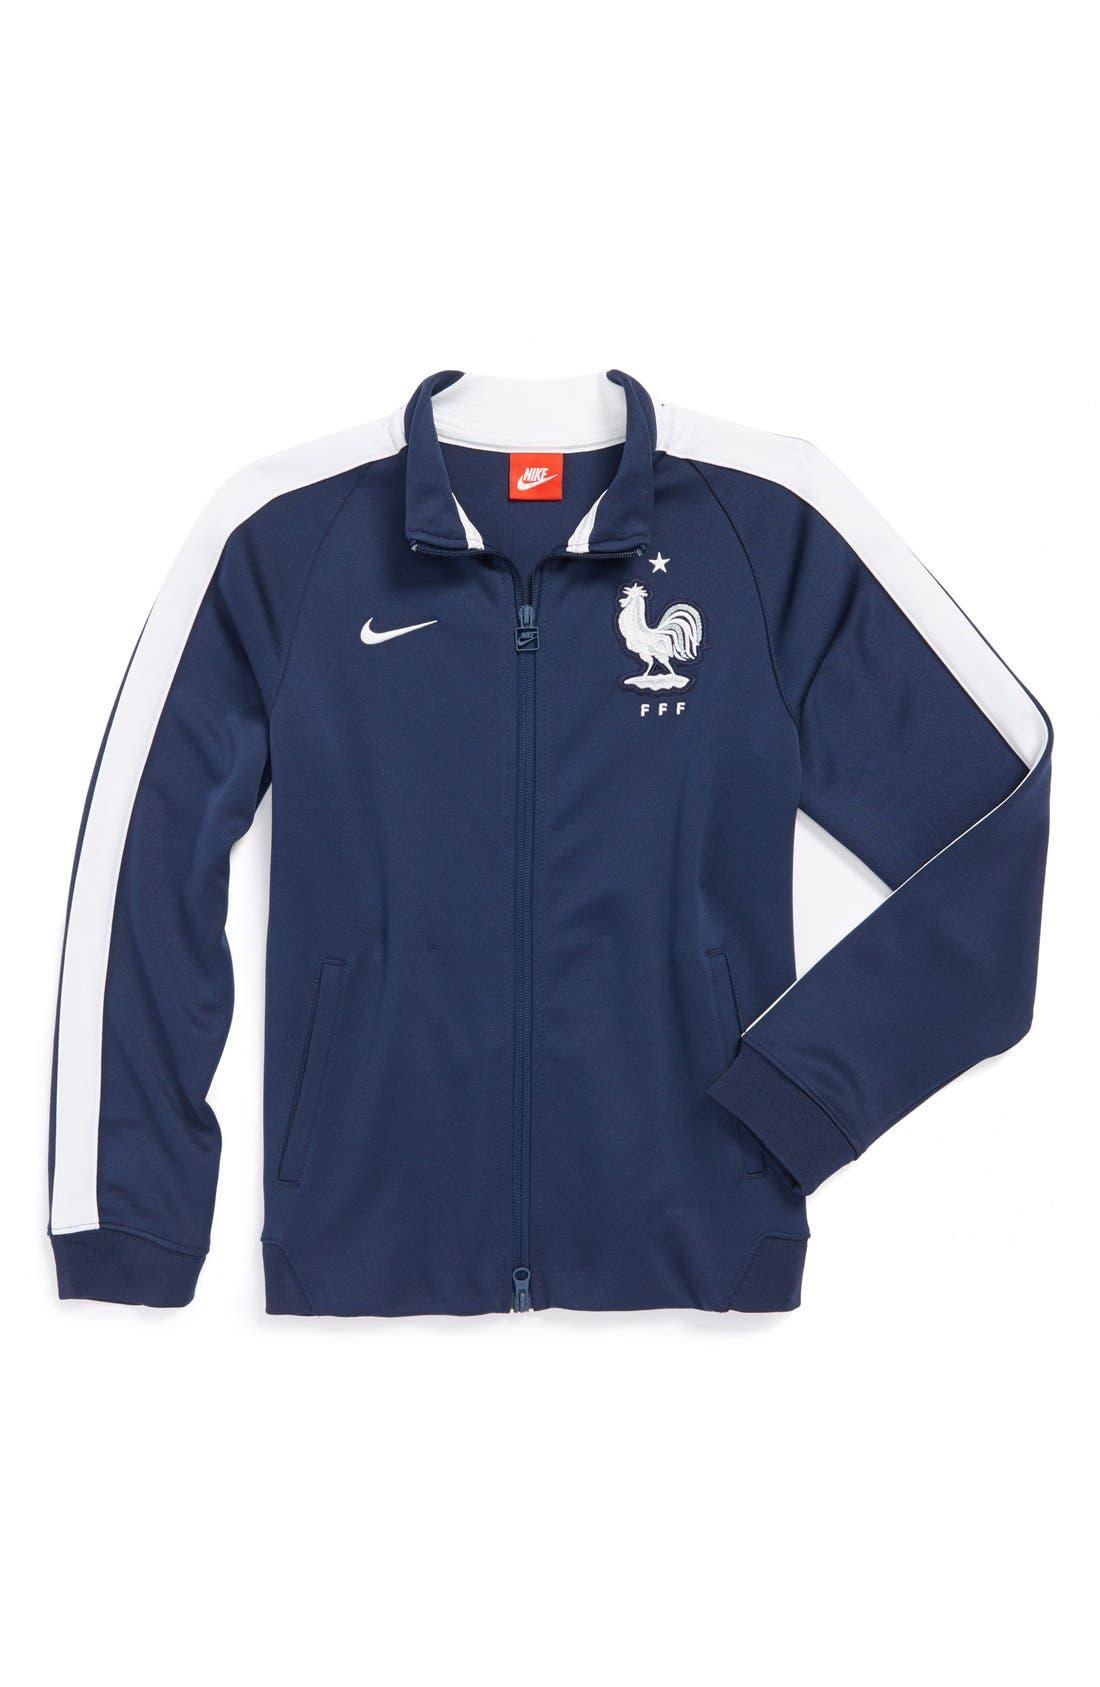 Main Image - Nike 'France FFF - N98 World Soccer Authentic' Track Jacket (Big Boys)